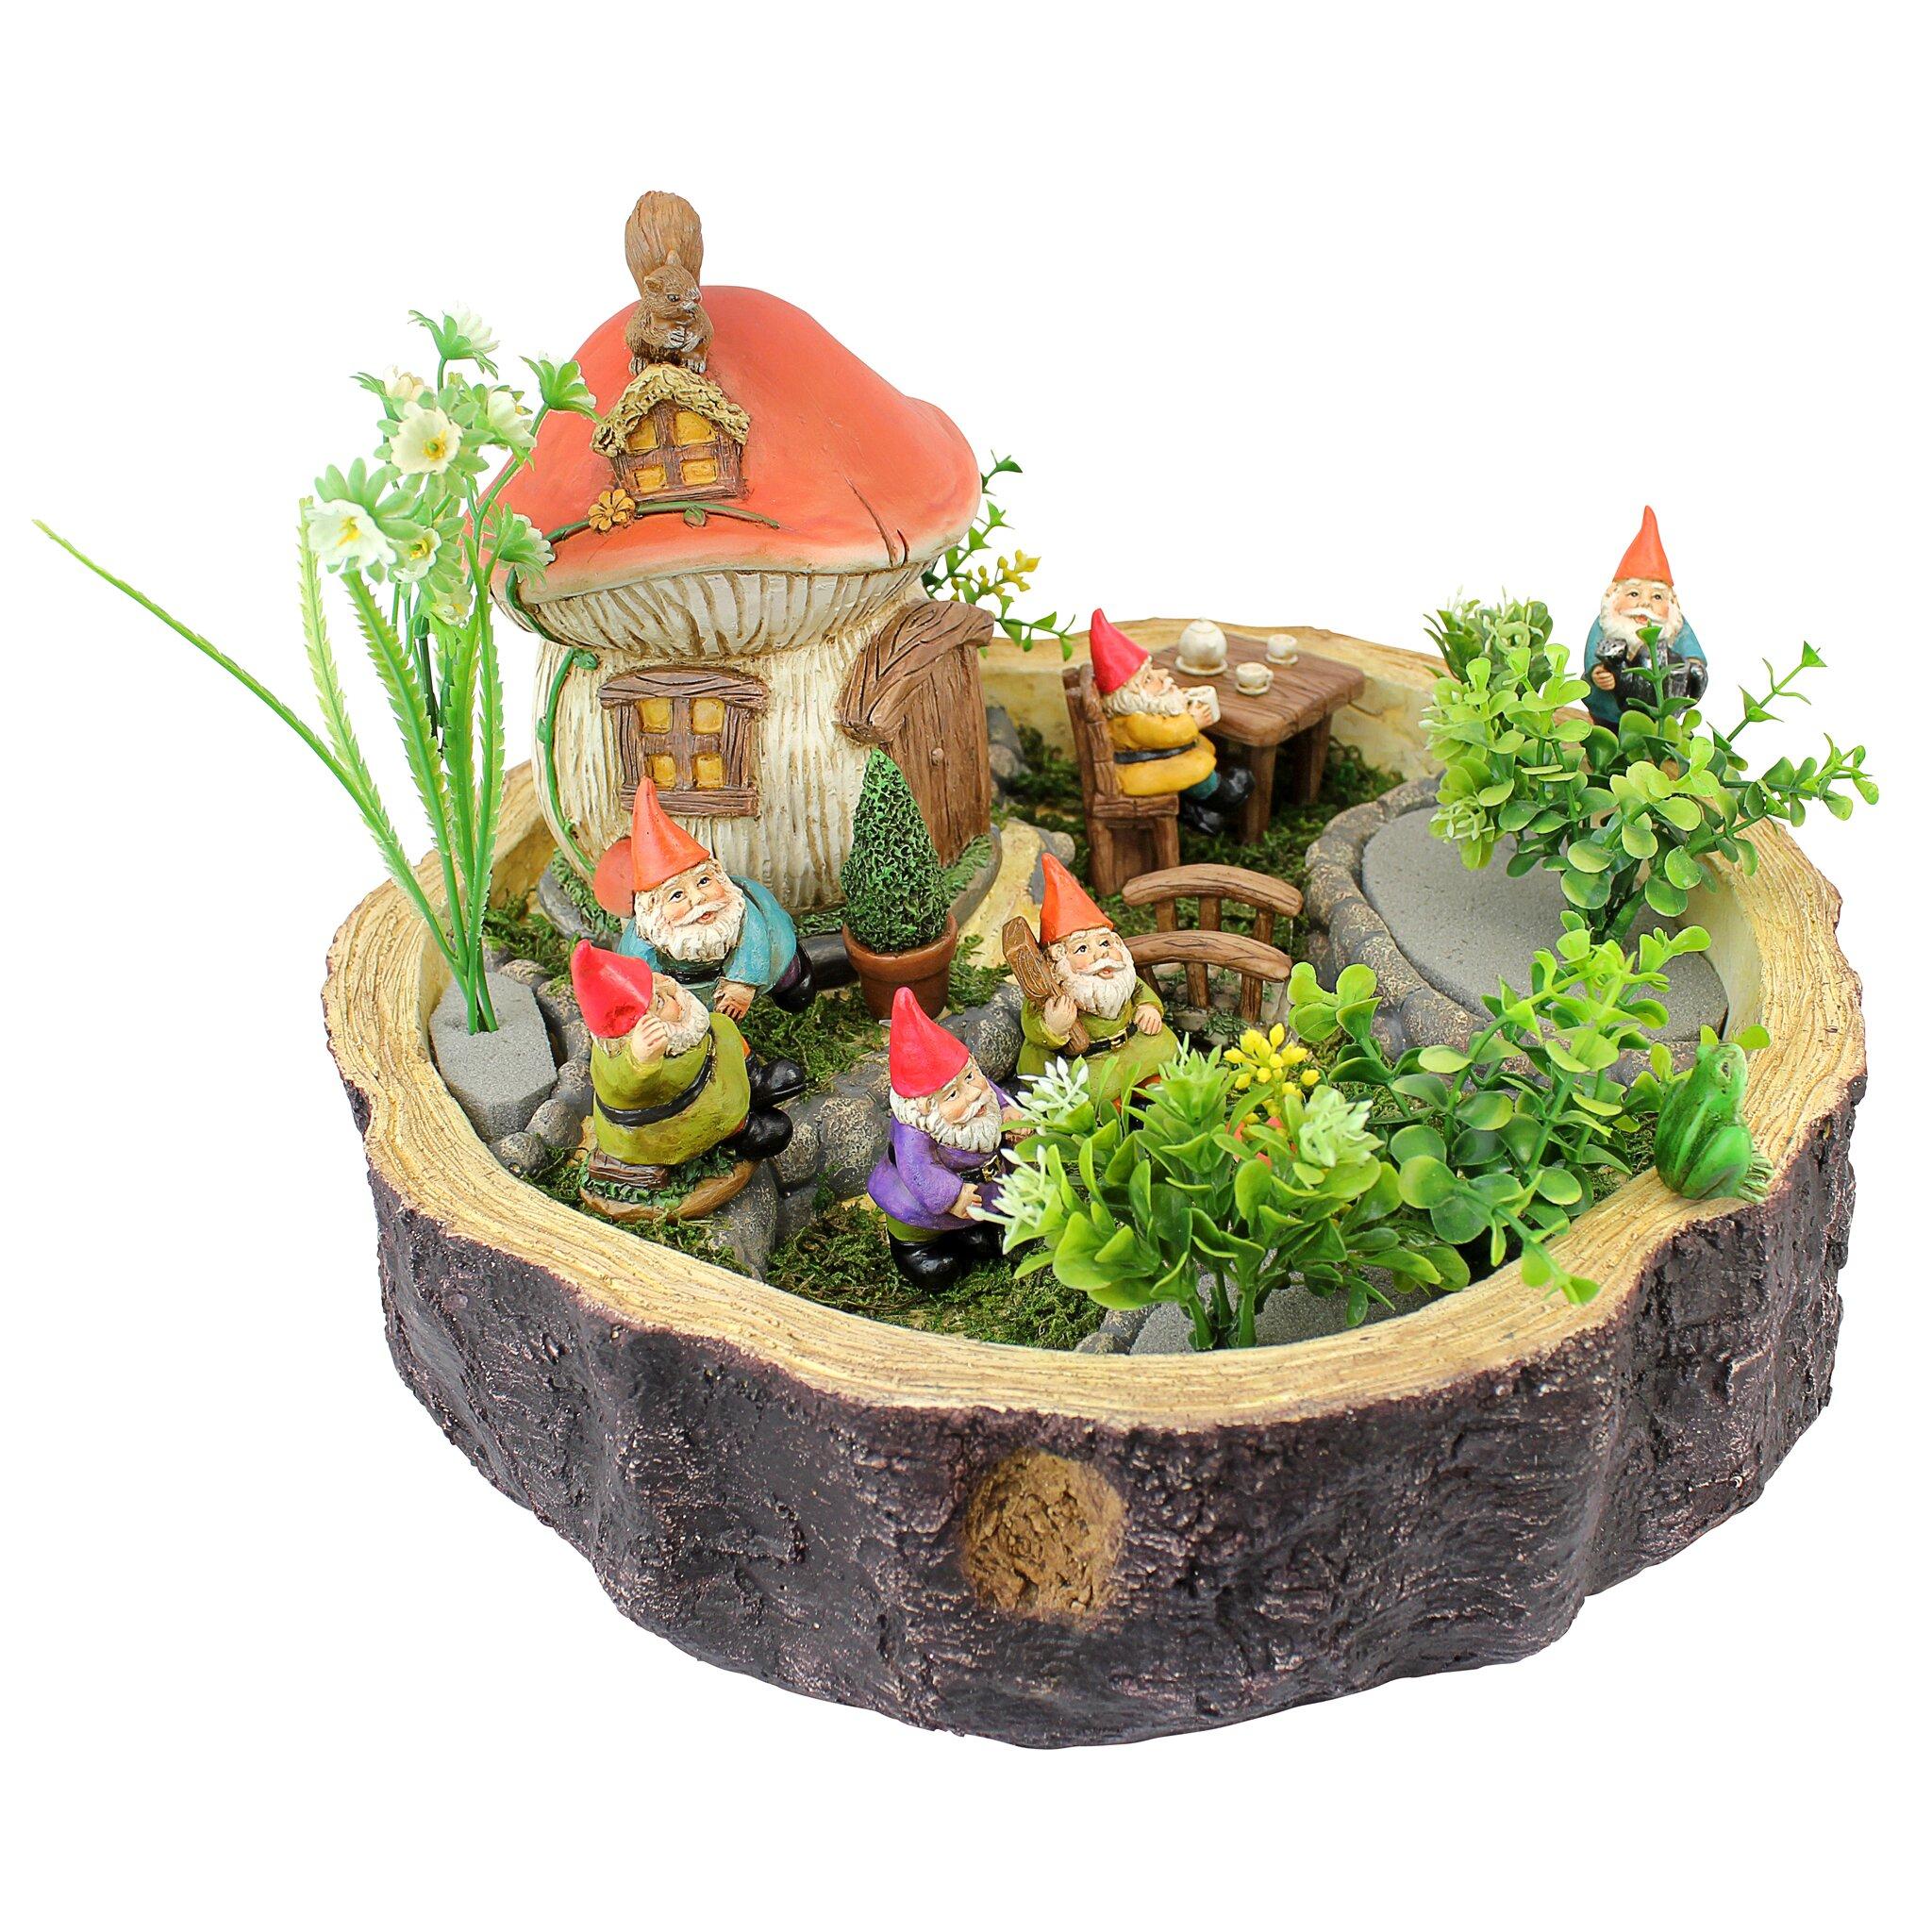 Gnome Garden: Tiny Forest Friends Gnome Garden Statue